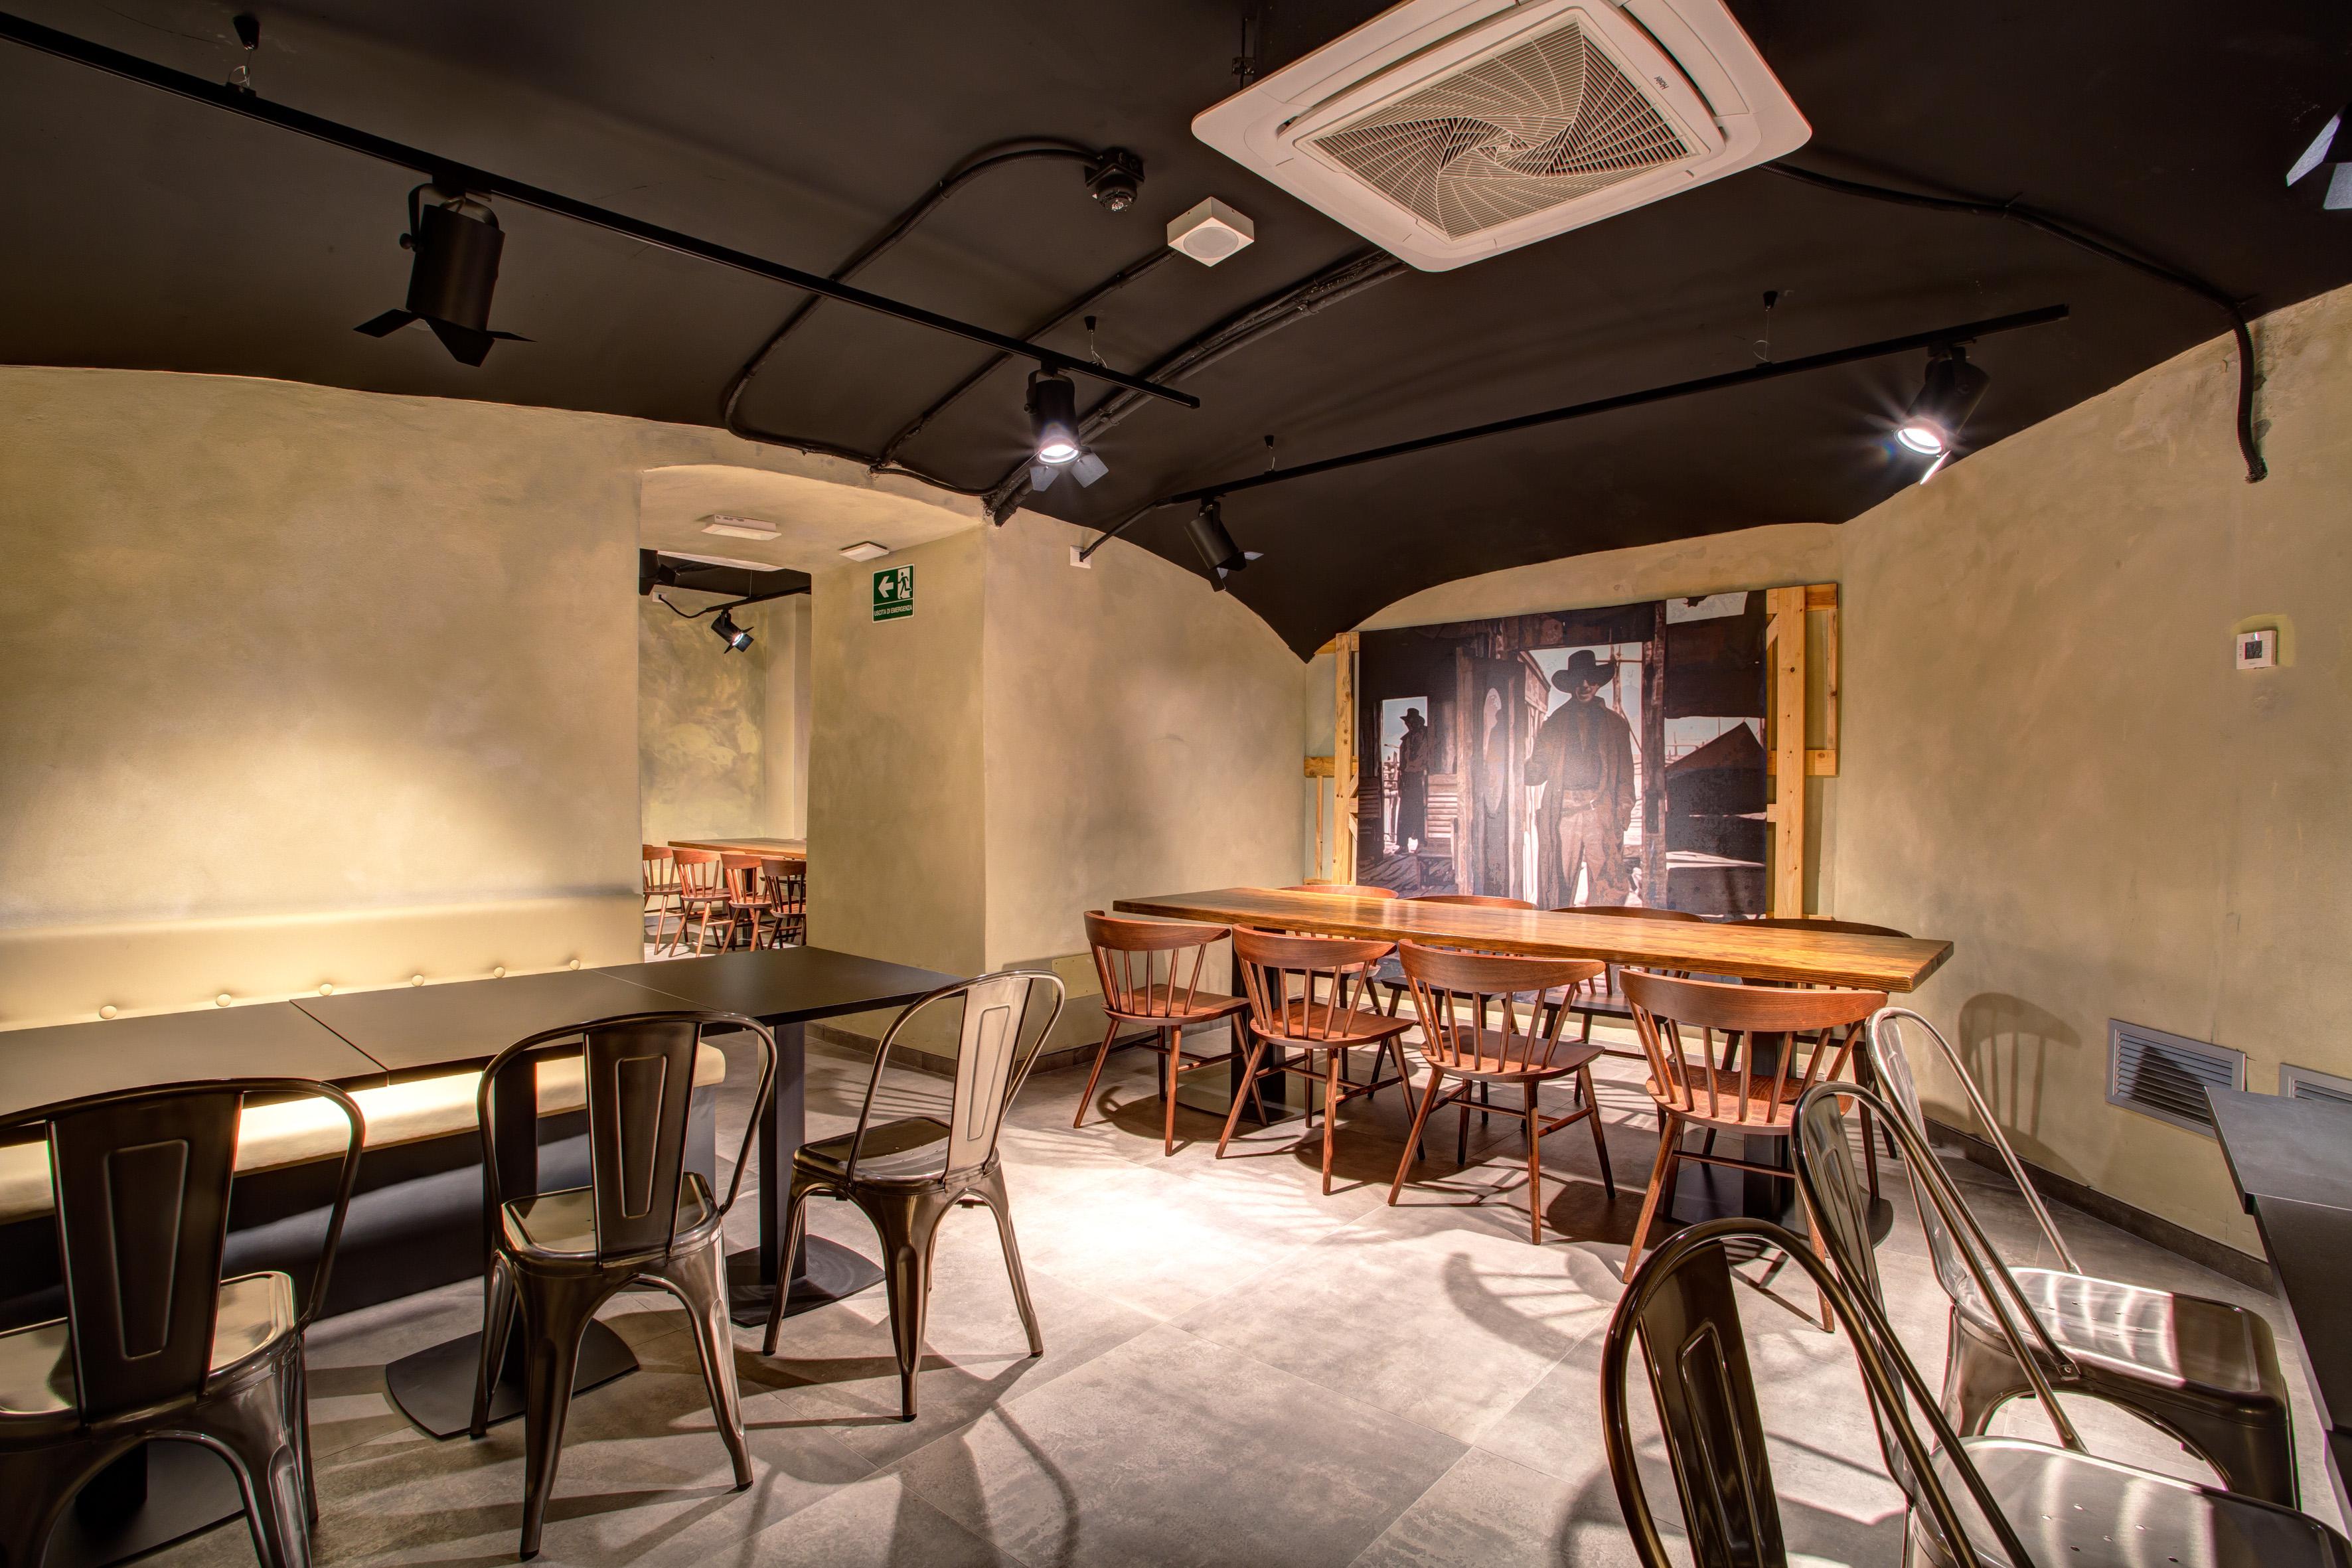 MEININGER Roma Termini - Sala de desayuno / Buffet